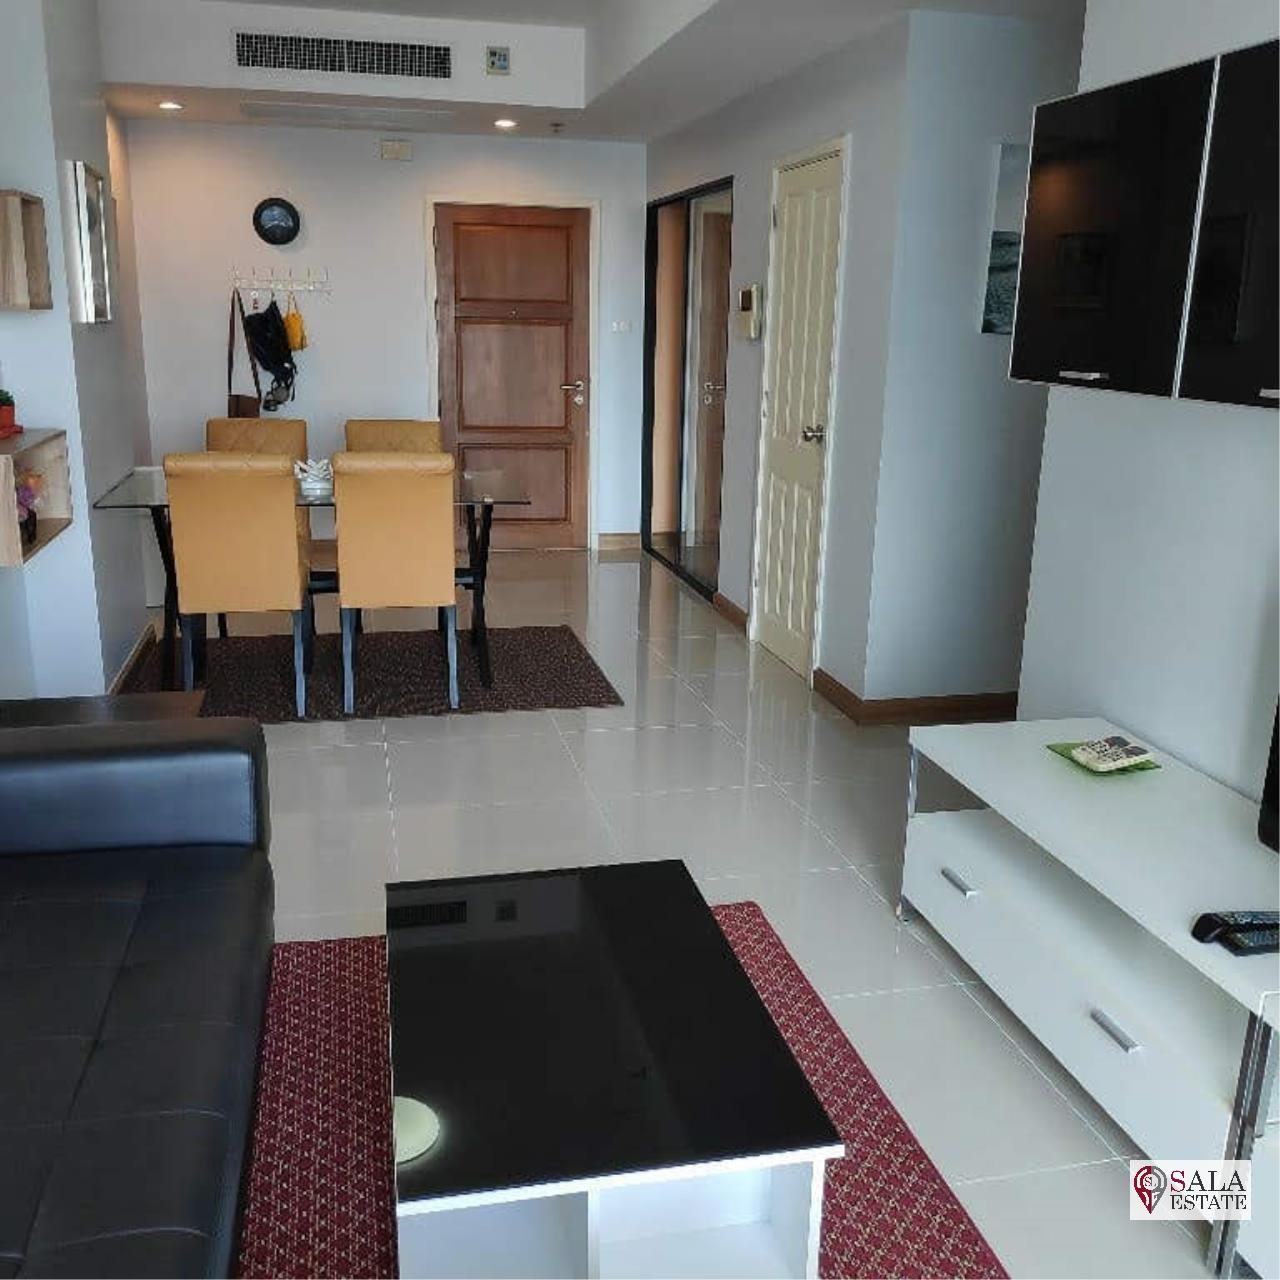 SALA ESTATE Agency's SUPALAI PREMIER NARATHIWAS – BTS CHONG NONSI, 1 BEDROOM 1 BATHROOM, FULLY FERNISHED, CITY VIEW 4